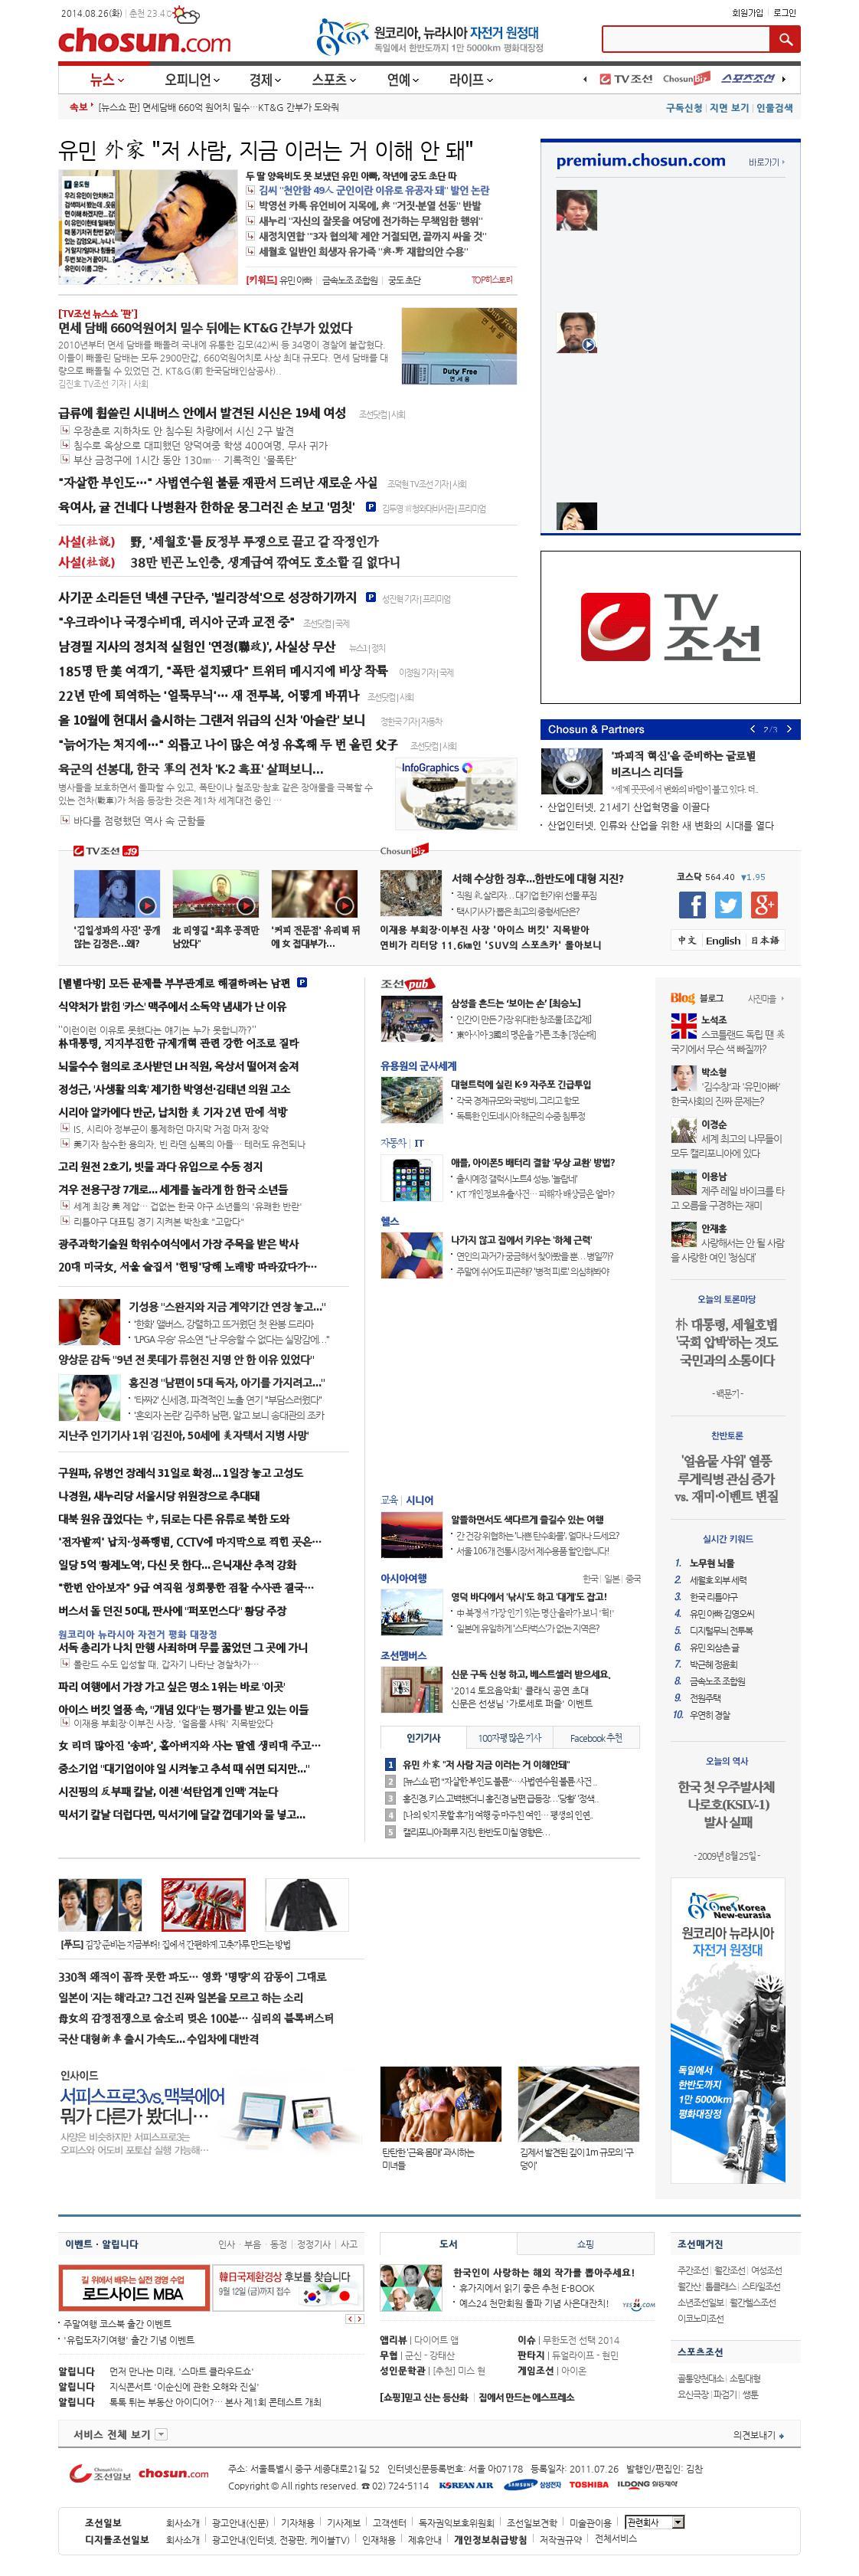 chosun.com at Monday Aug. 25, 2014, 5:04 p.m. UTC